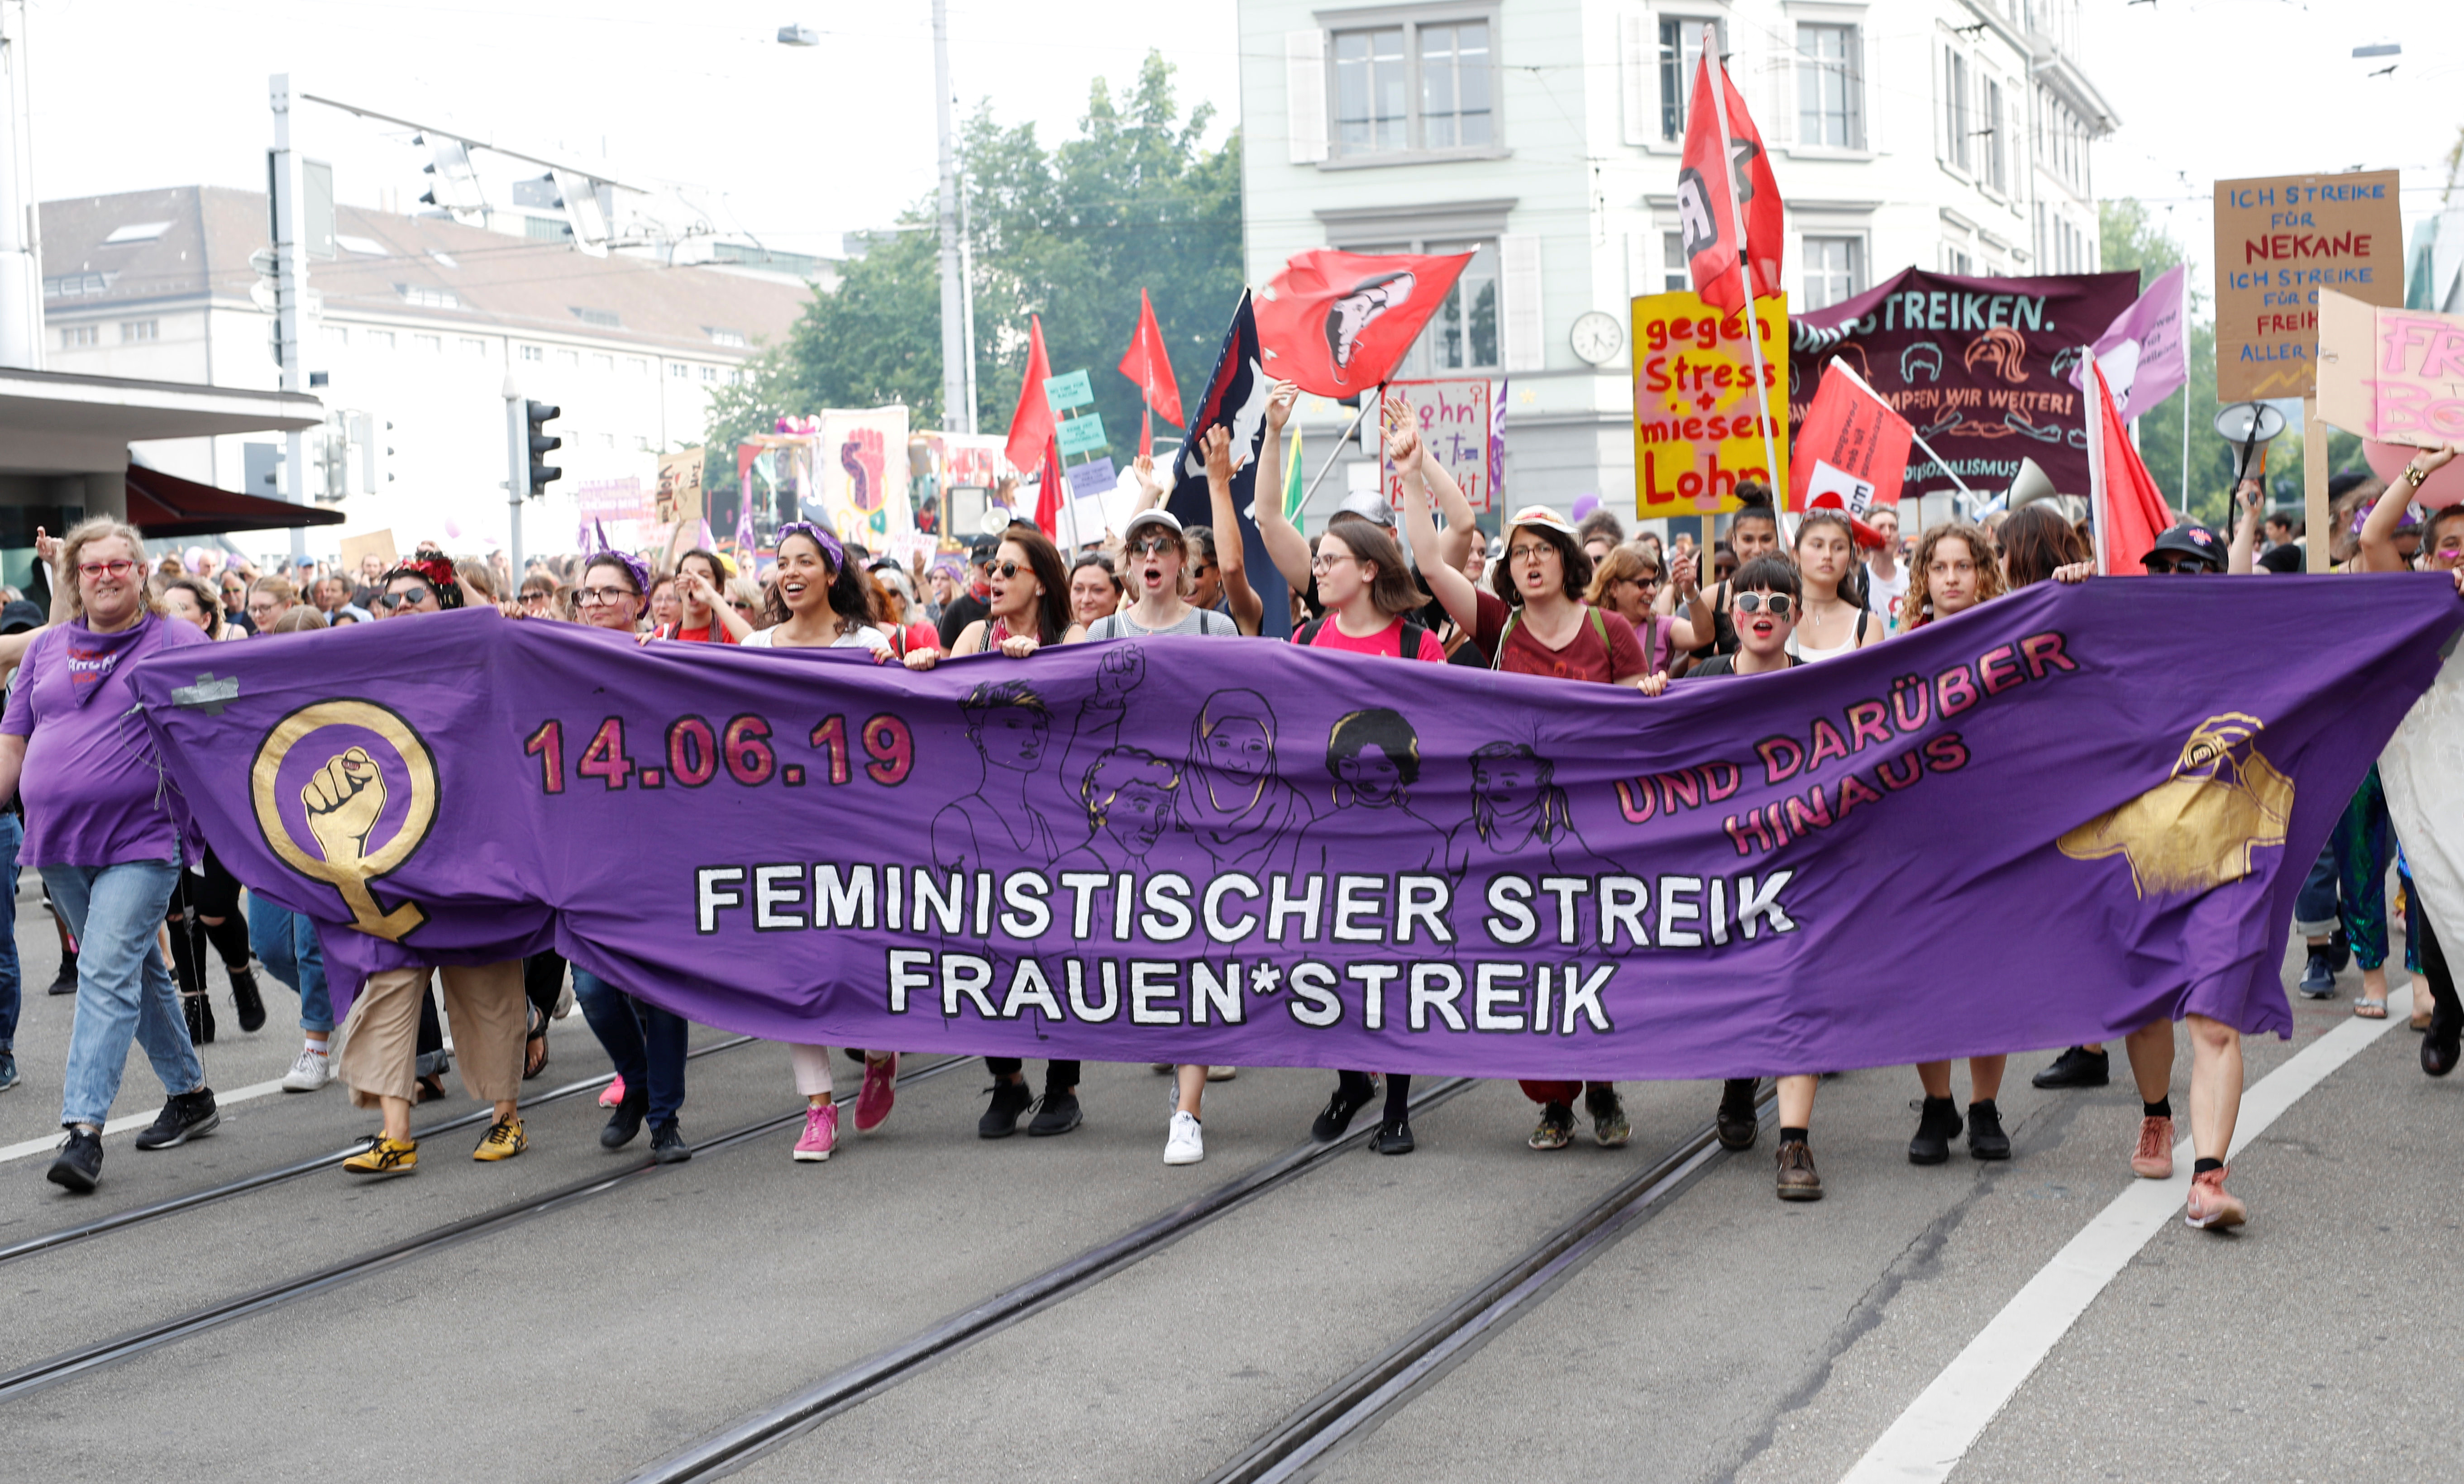 Protesters at a women's strike in Zurich, Switzerland, June 2019.